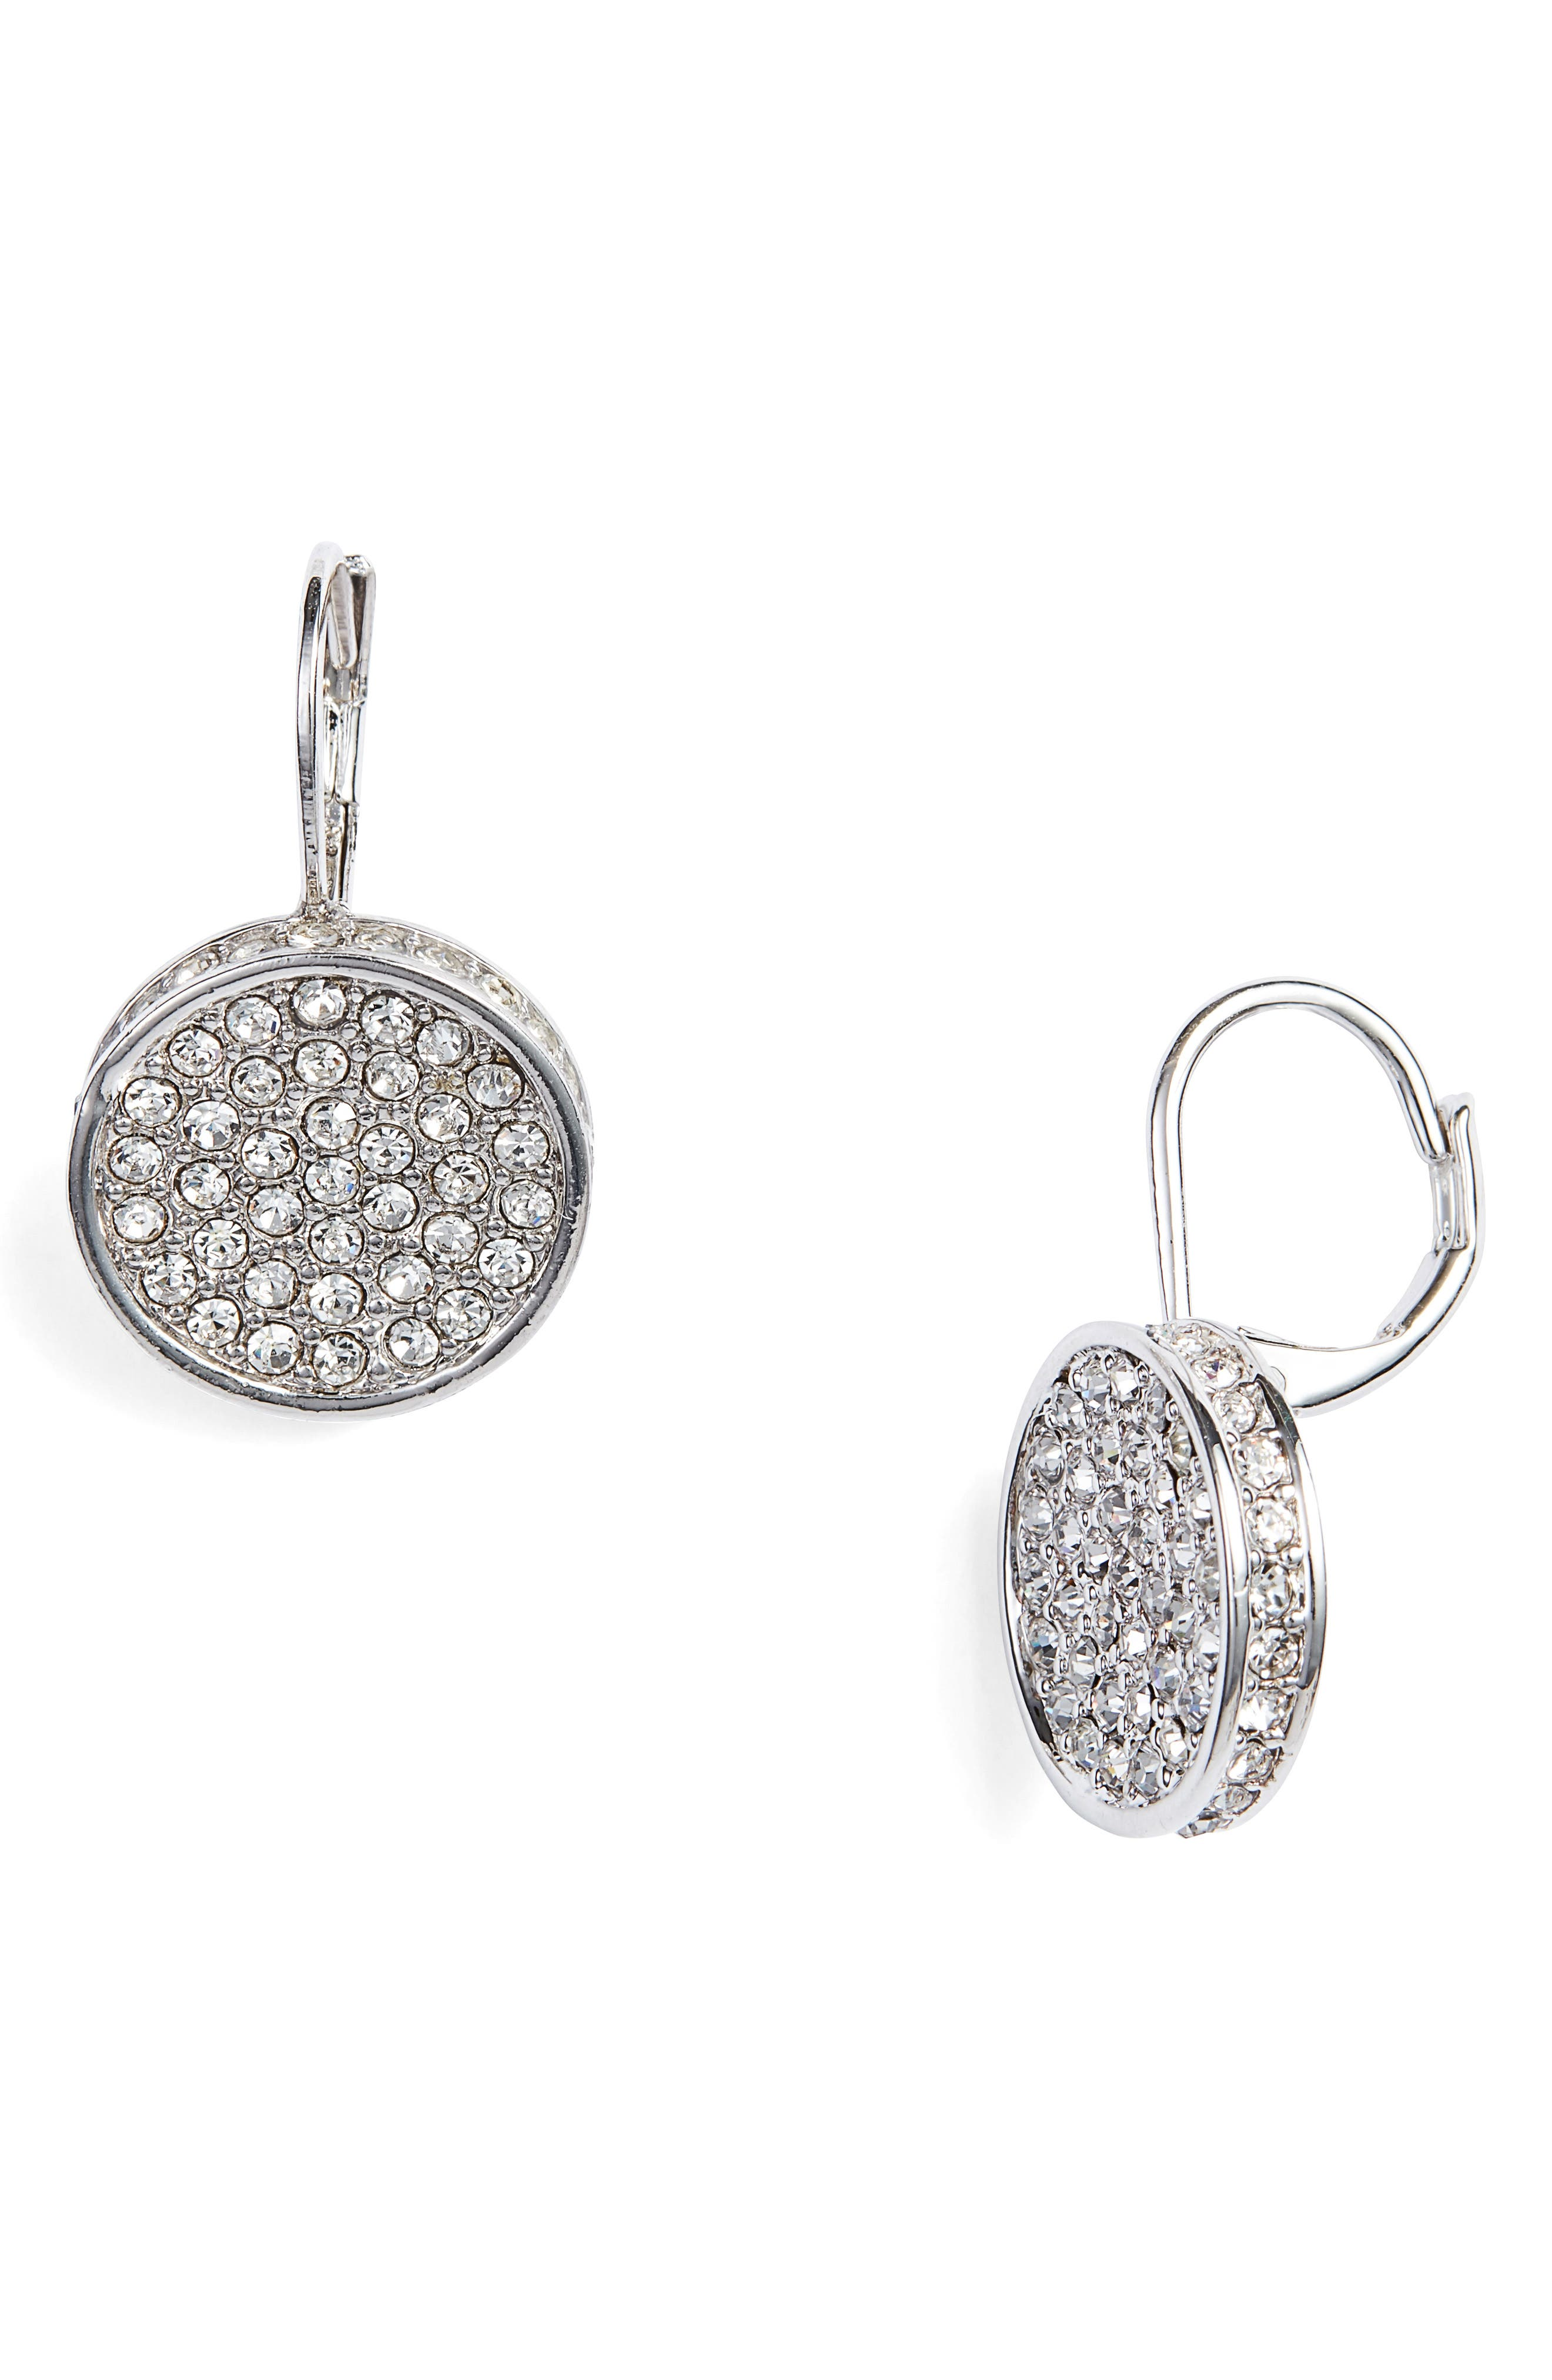 Crystal Glitter Earrings,                             Main thumbnail 1, color,                             041